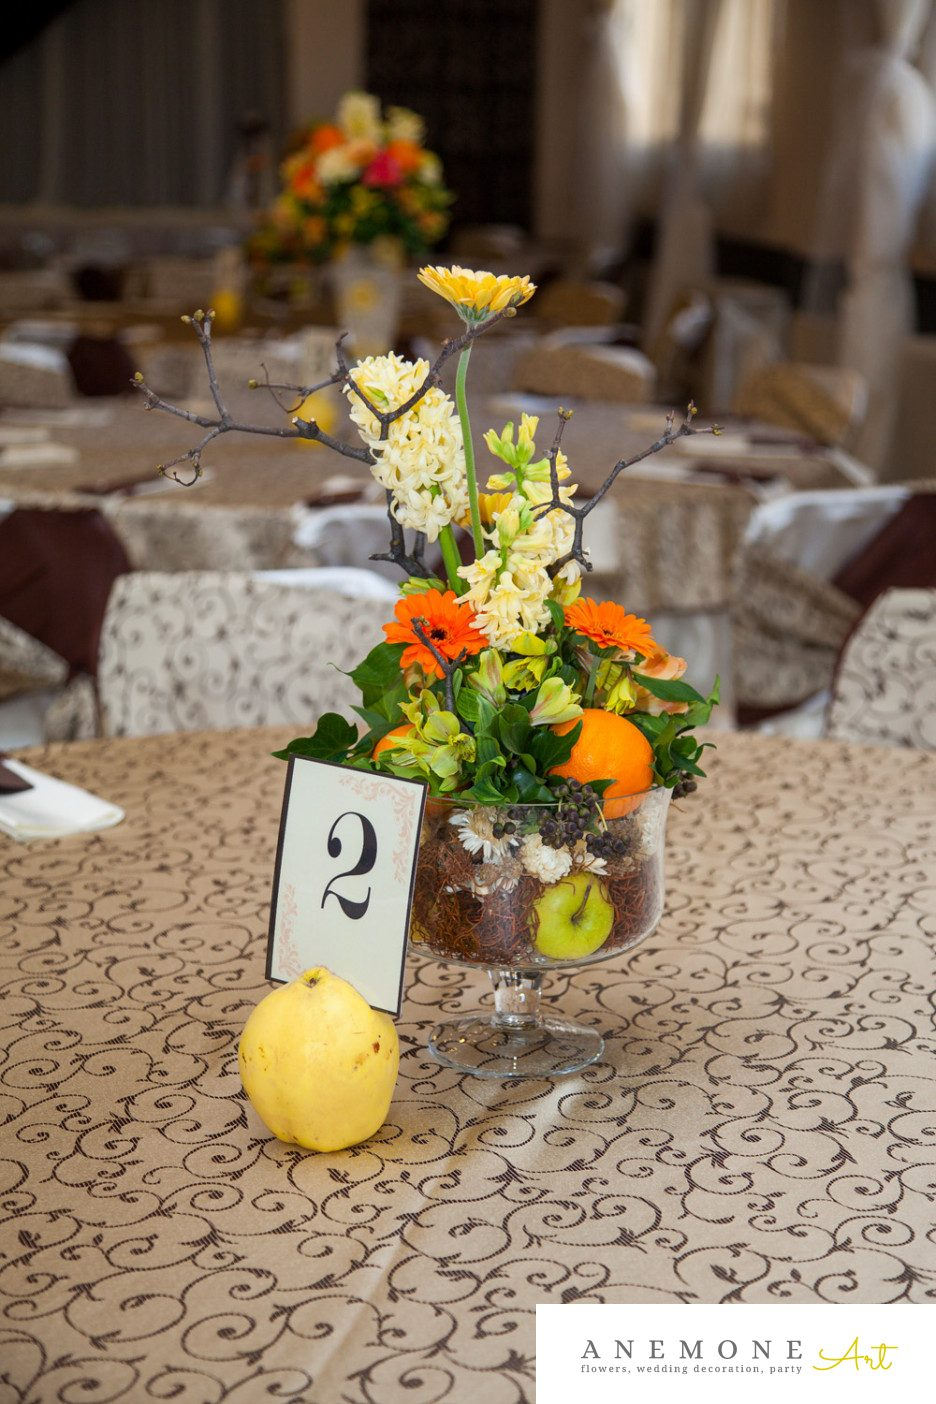 Poza, foto cu Flori de nunta crengi, decor masa, fructe, maro, portocaliu, toamna in Arad, Timisoara, Oradea (wedding flowers, bouquets) nunta Arad, Timisoara, Oradea